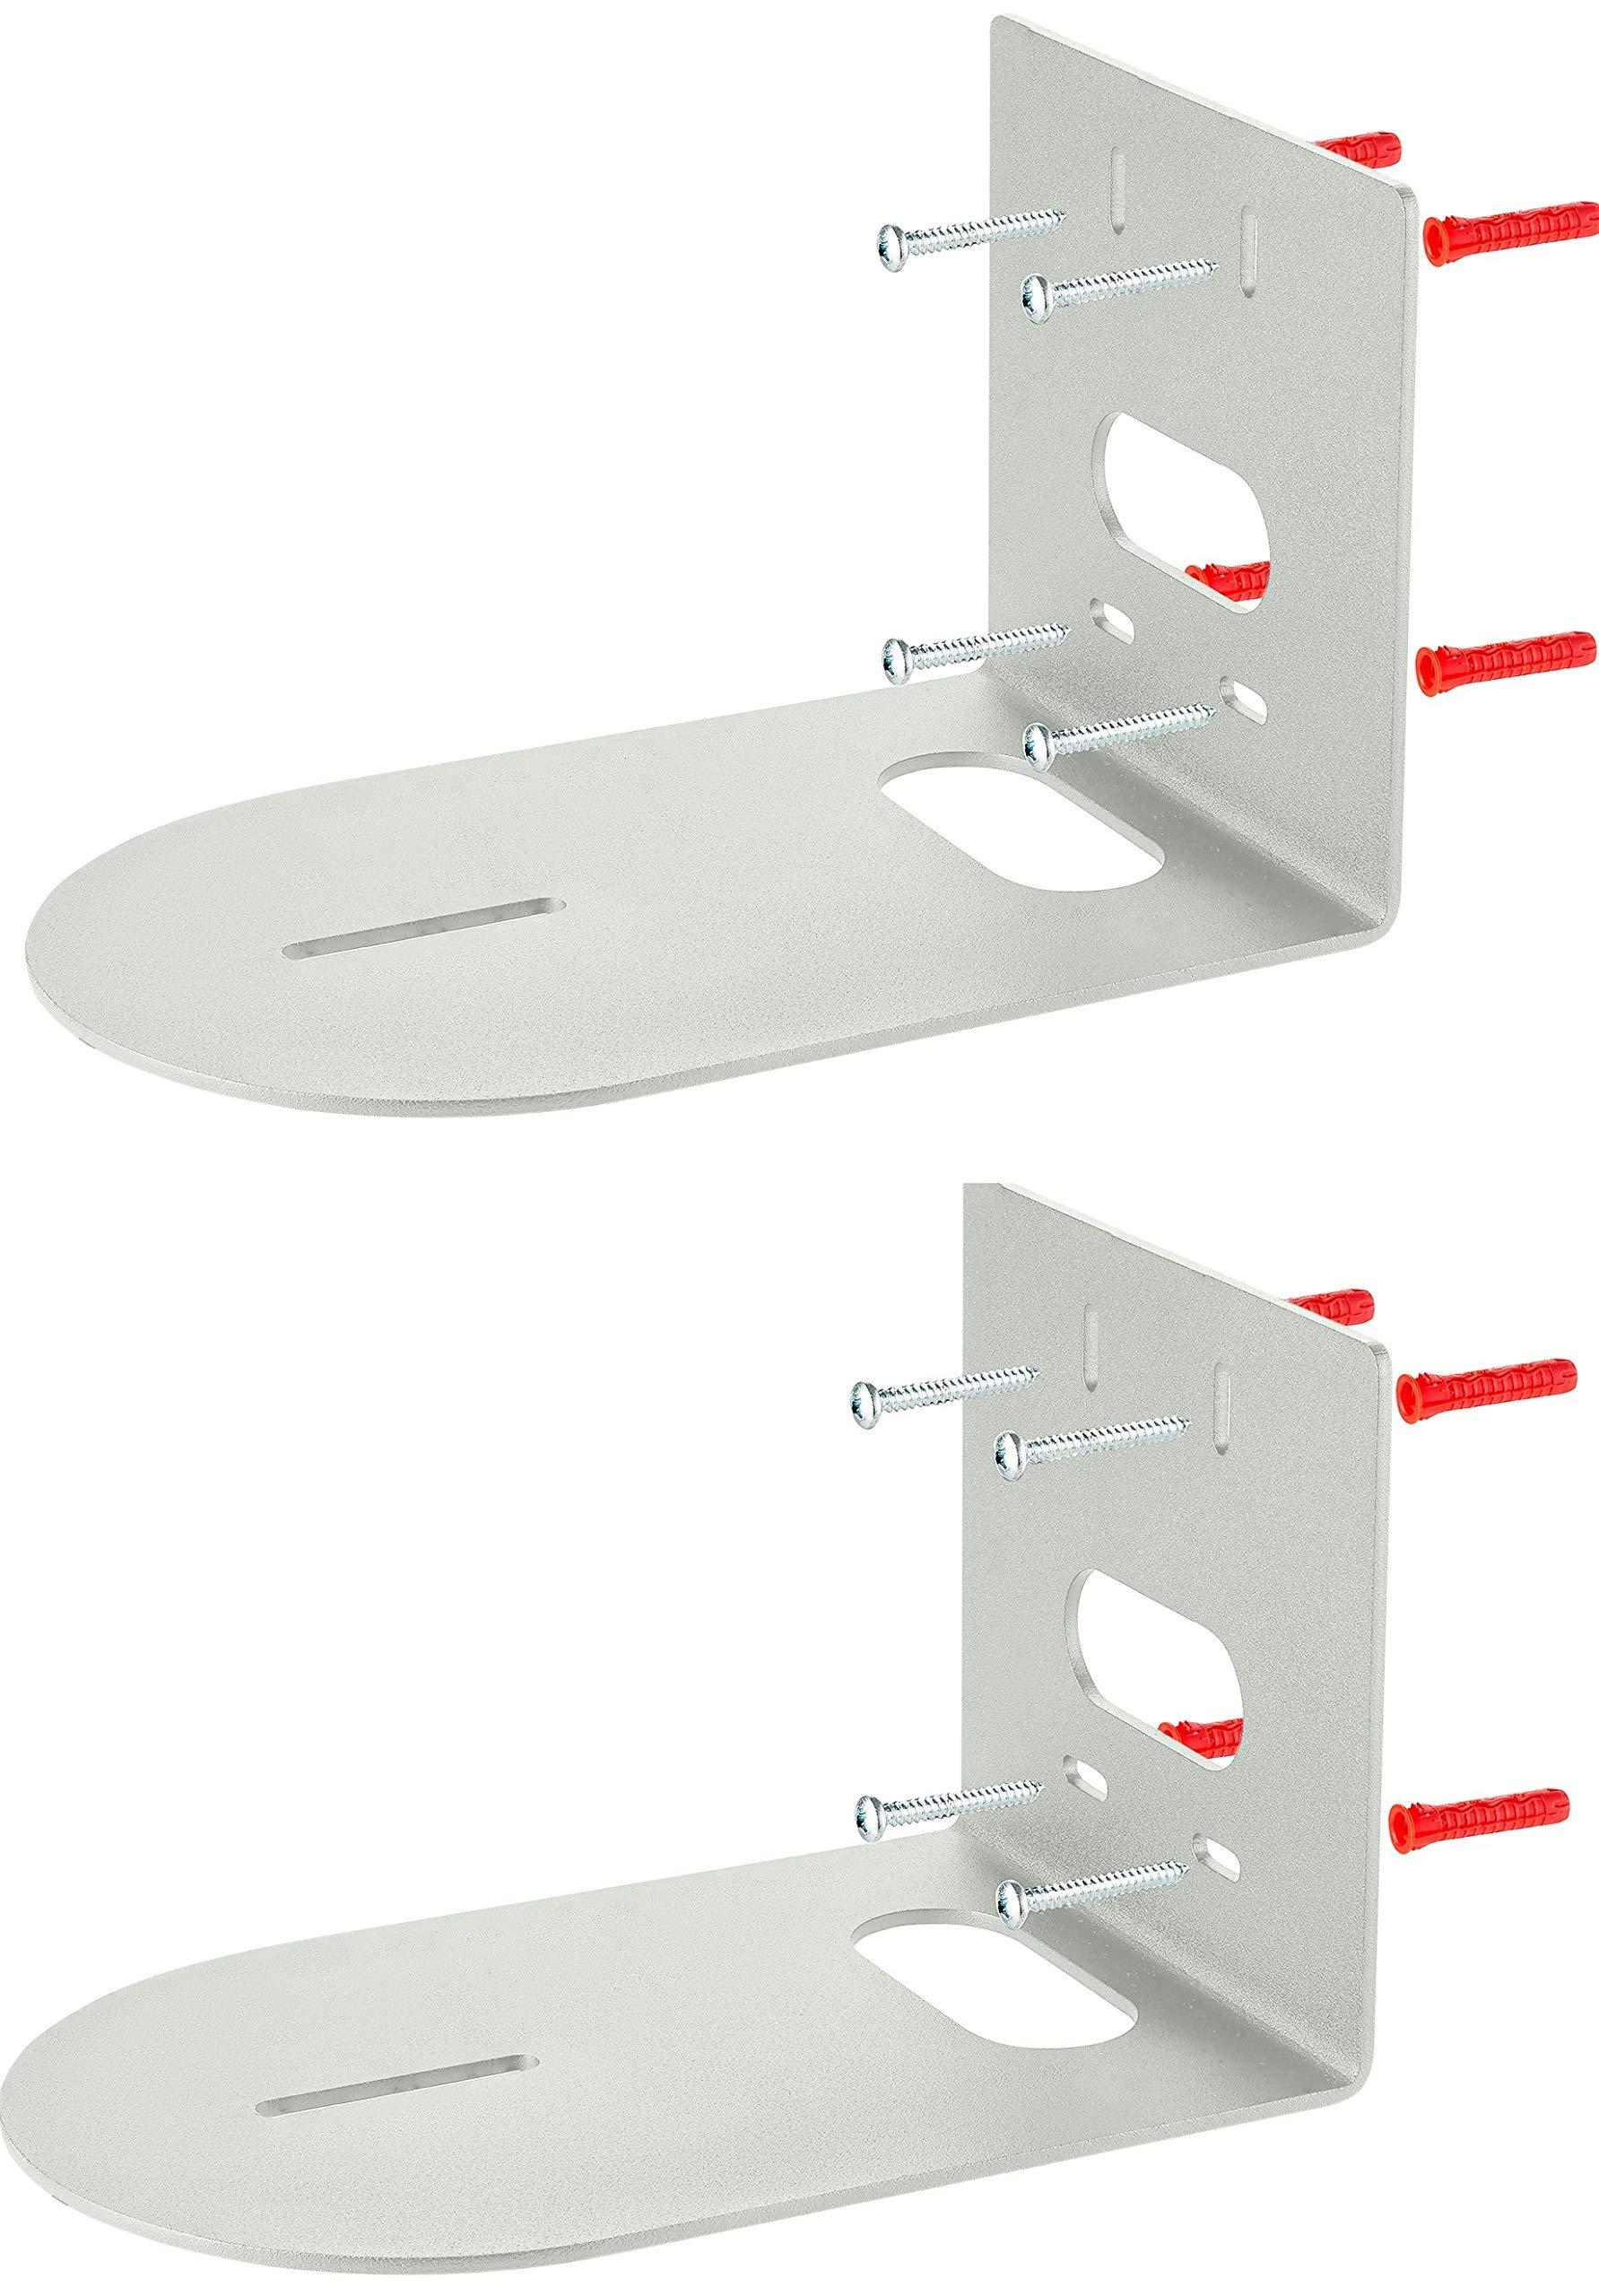 Set of 2 Small Universal Conference Camera Wall Mount fits Lifesize PTZOptics PTZ Camera Huddlecam HuddleCamHD - Cam Arm Bracket Replaces HCM-1-BK HCM-1-WH HCM-1 - Drywall Plastic Wood Masonry - Gray by Metral Universe